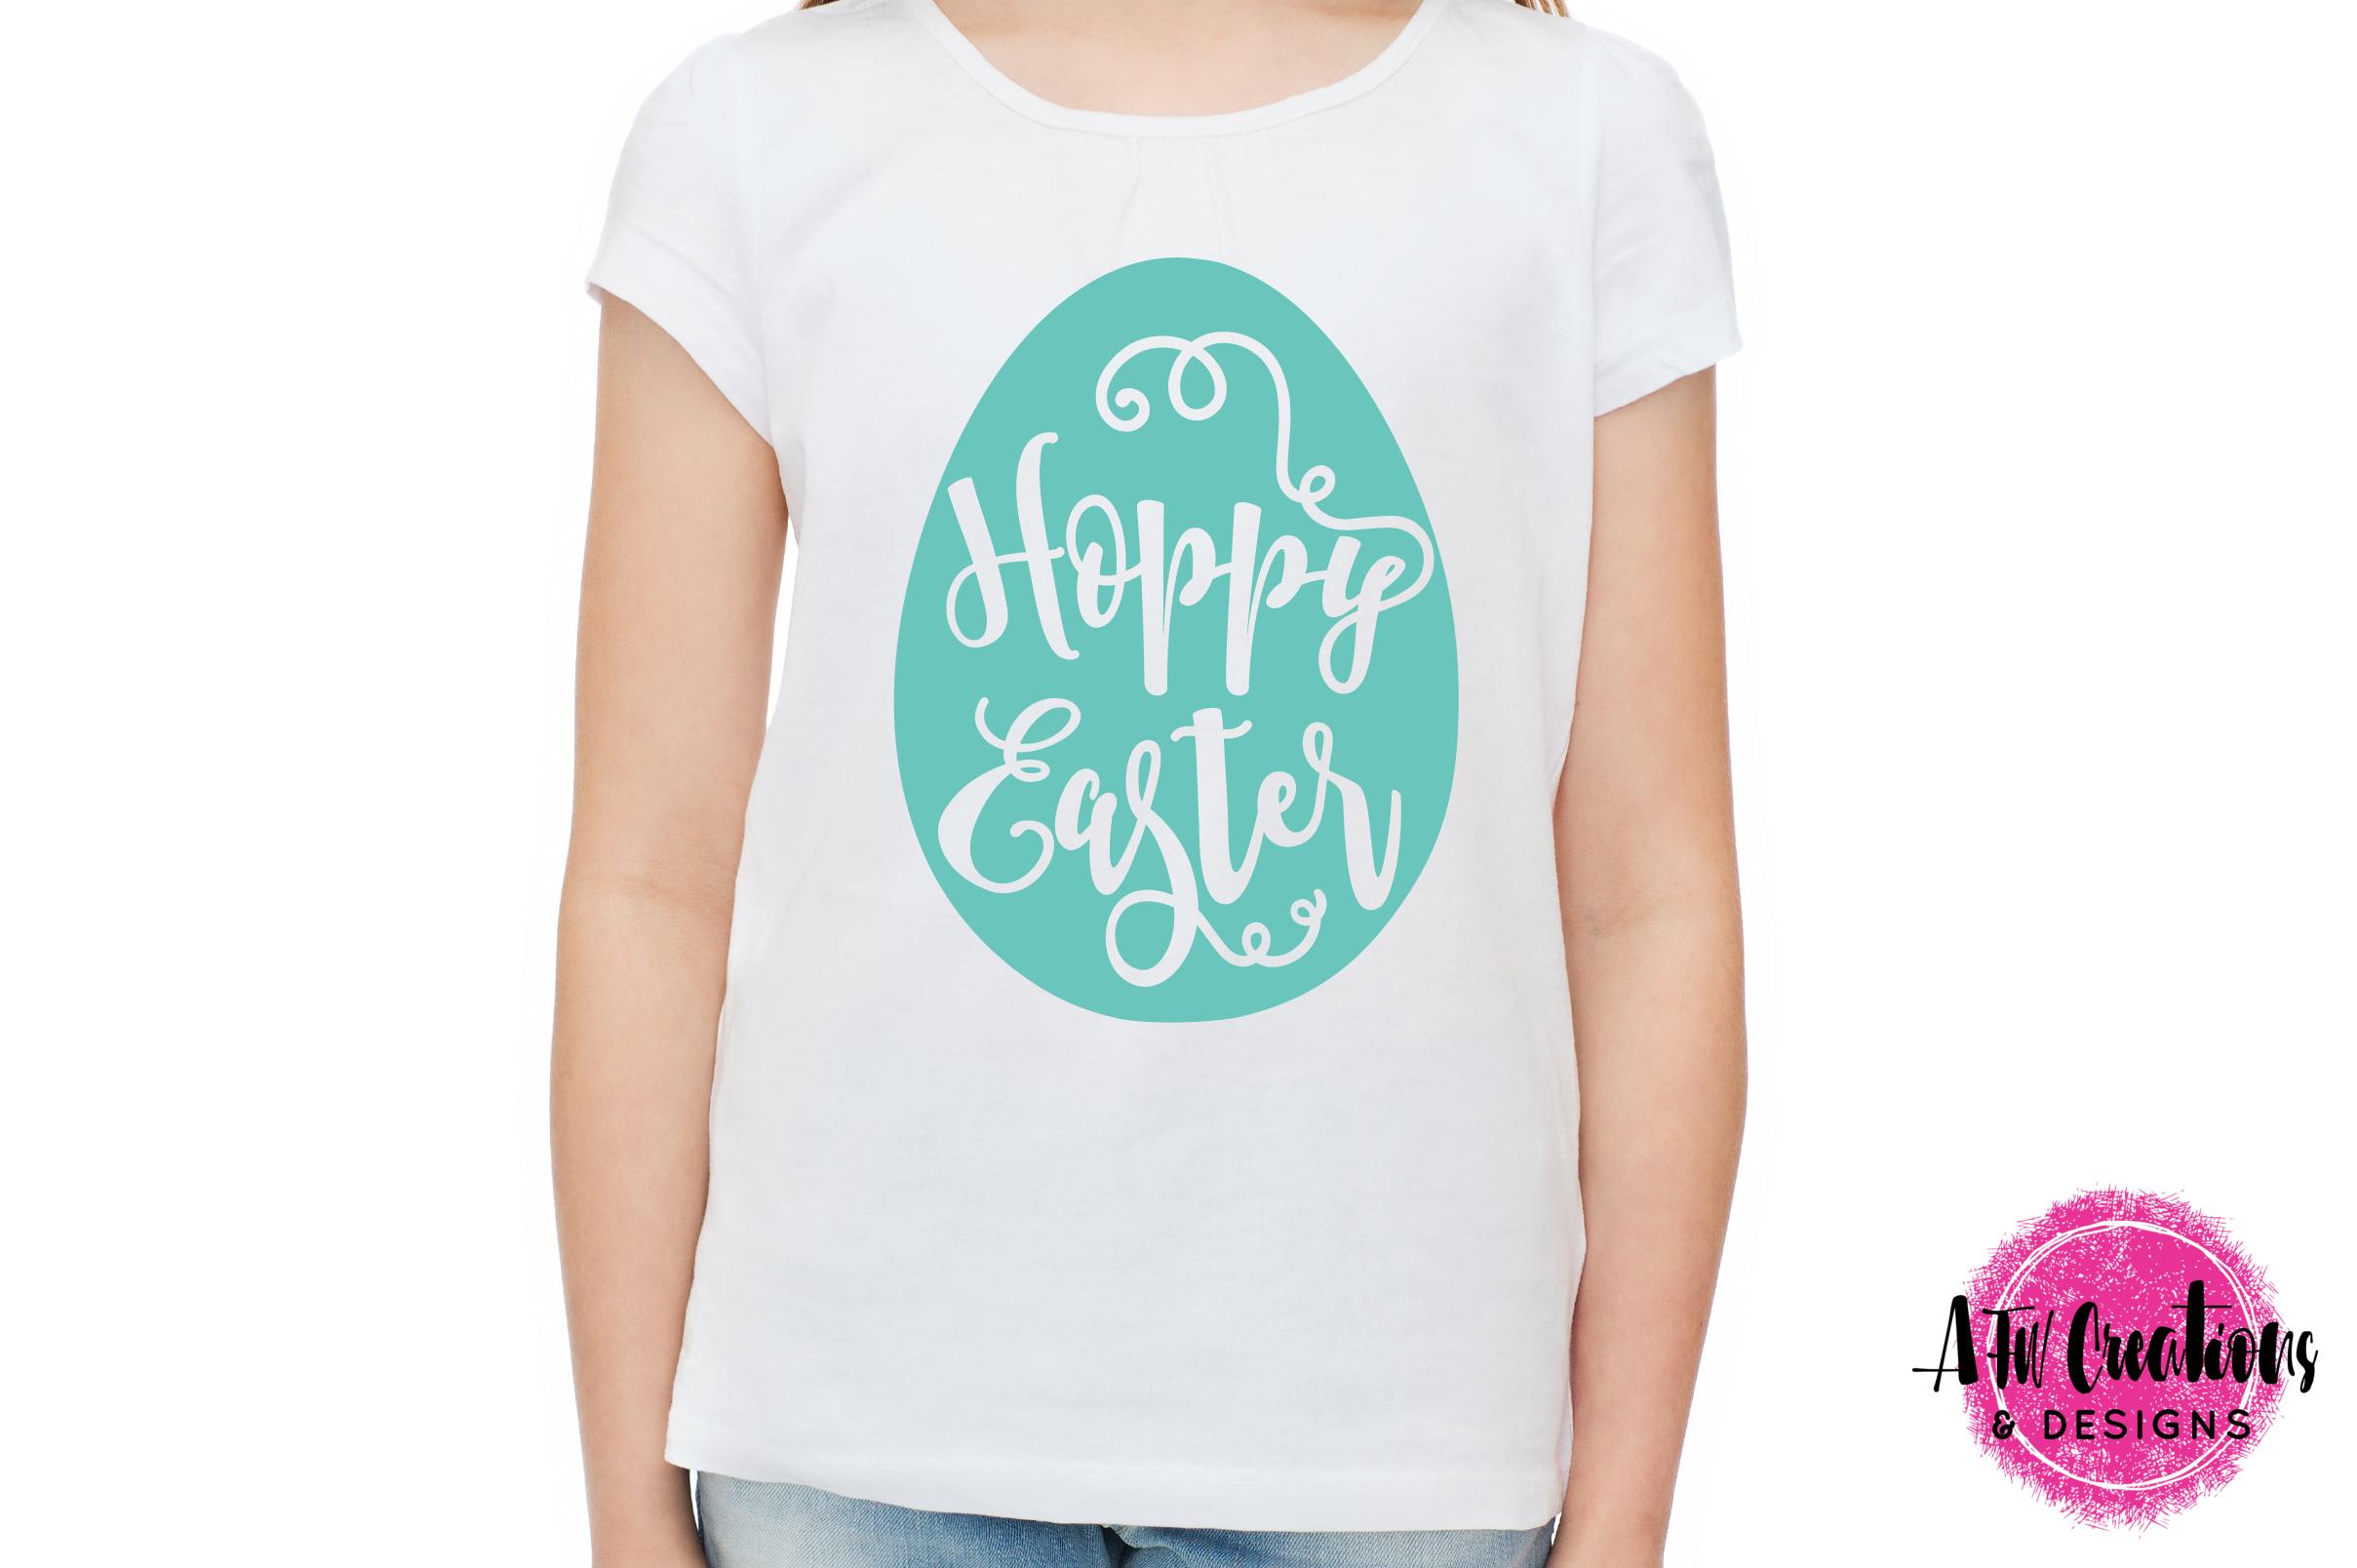 Hoppy Easter Egg - SVG, DXF, EPS Cut File example image 2